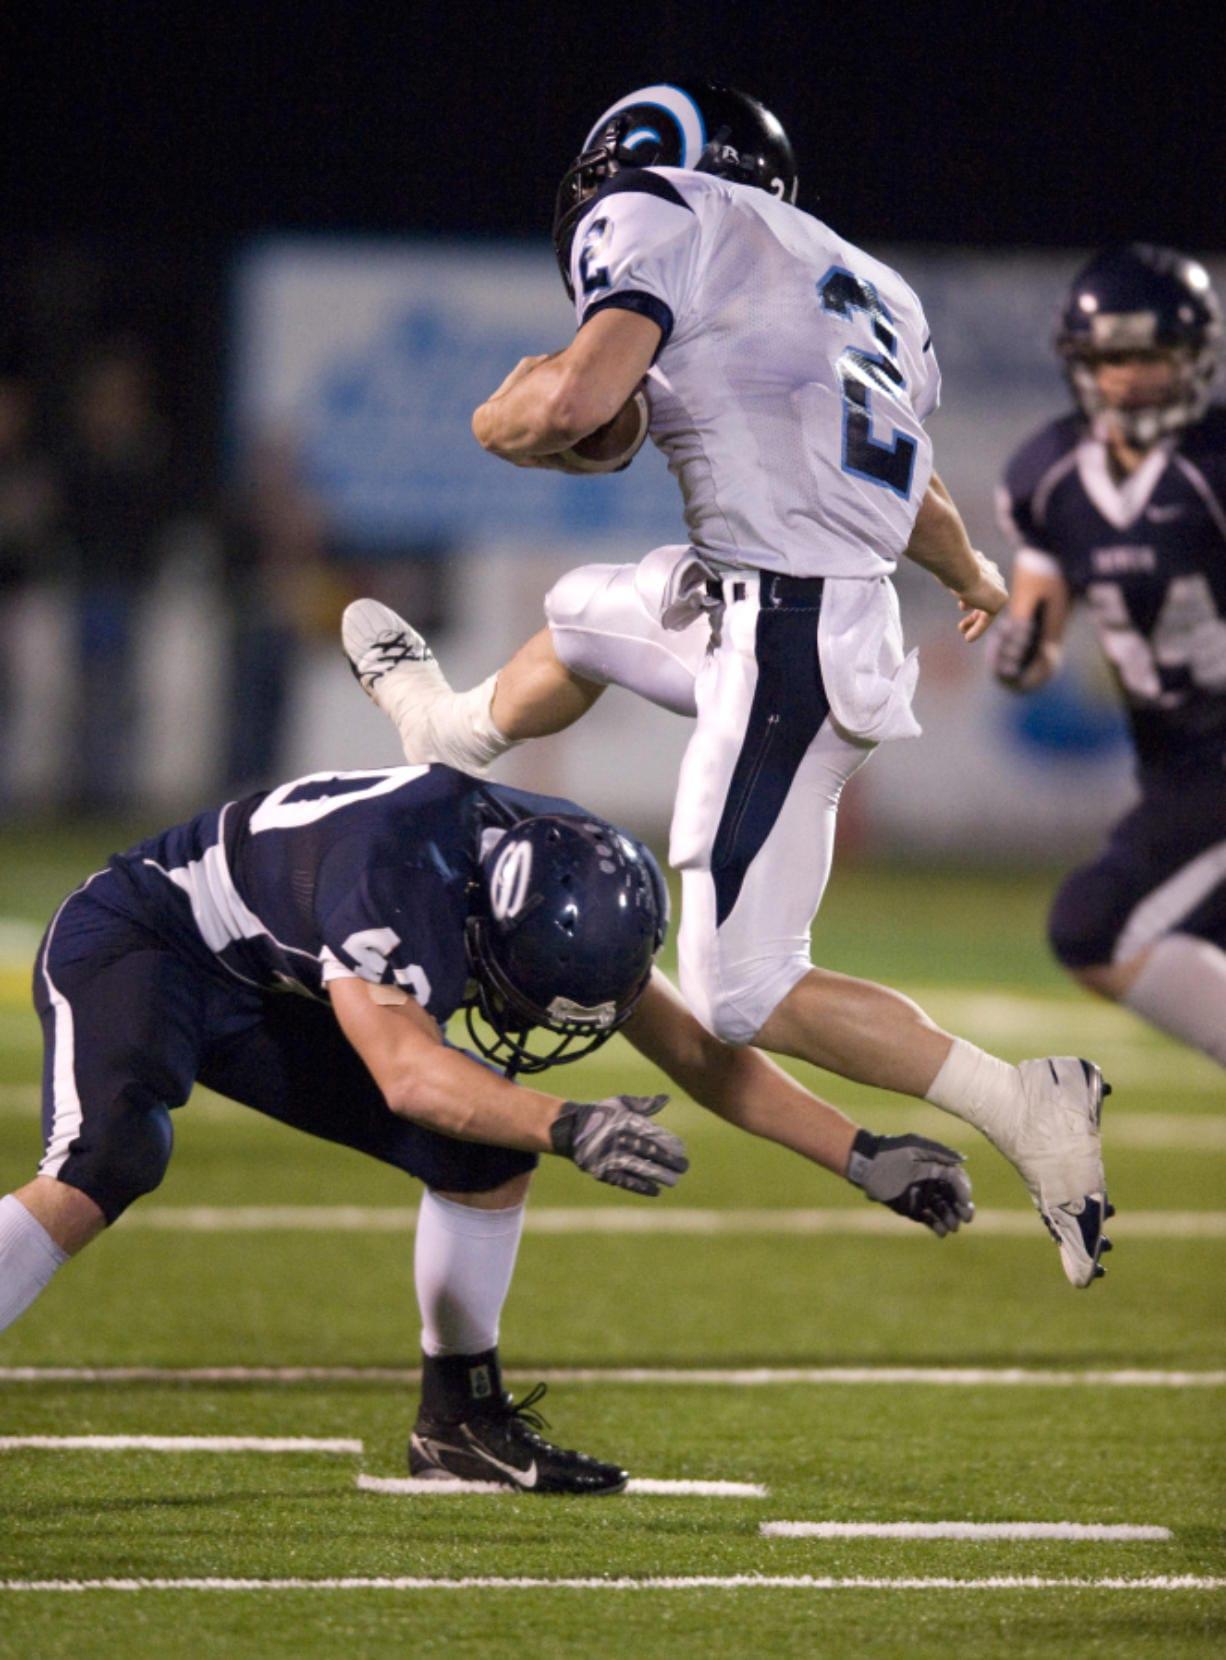 Rogers Rams QB Tyler Van Sligtenhorst, #2, leaps over Skyview LB Jason Leineweber, #40, at Kiggins Bowl, Saturday, November 15, 2008.